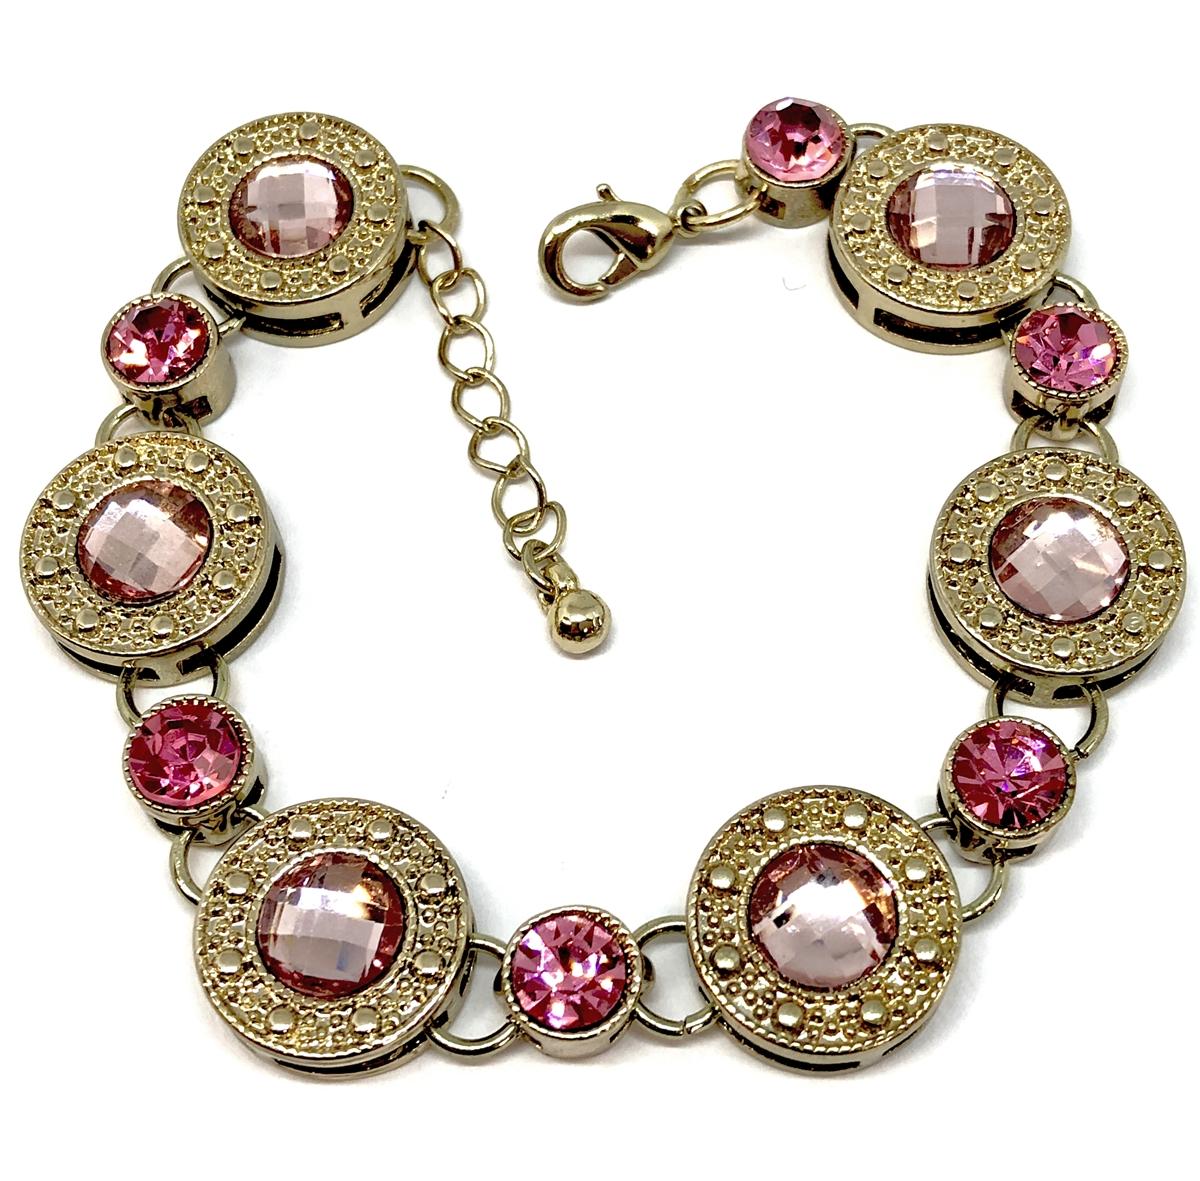 1928 Jewelry Company Imitation Rose Stud Bracelet Gold Plate Us Made